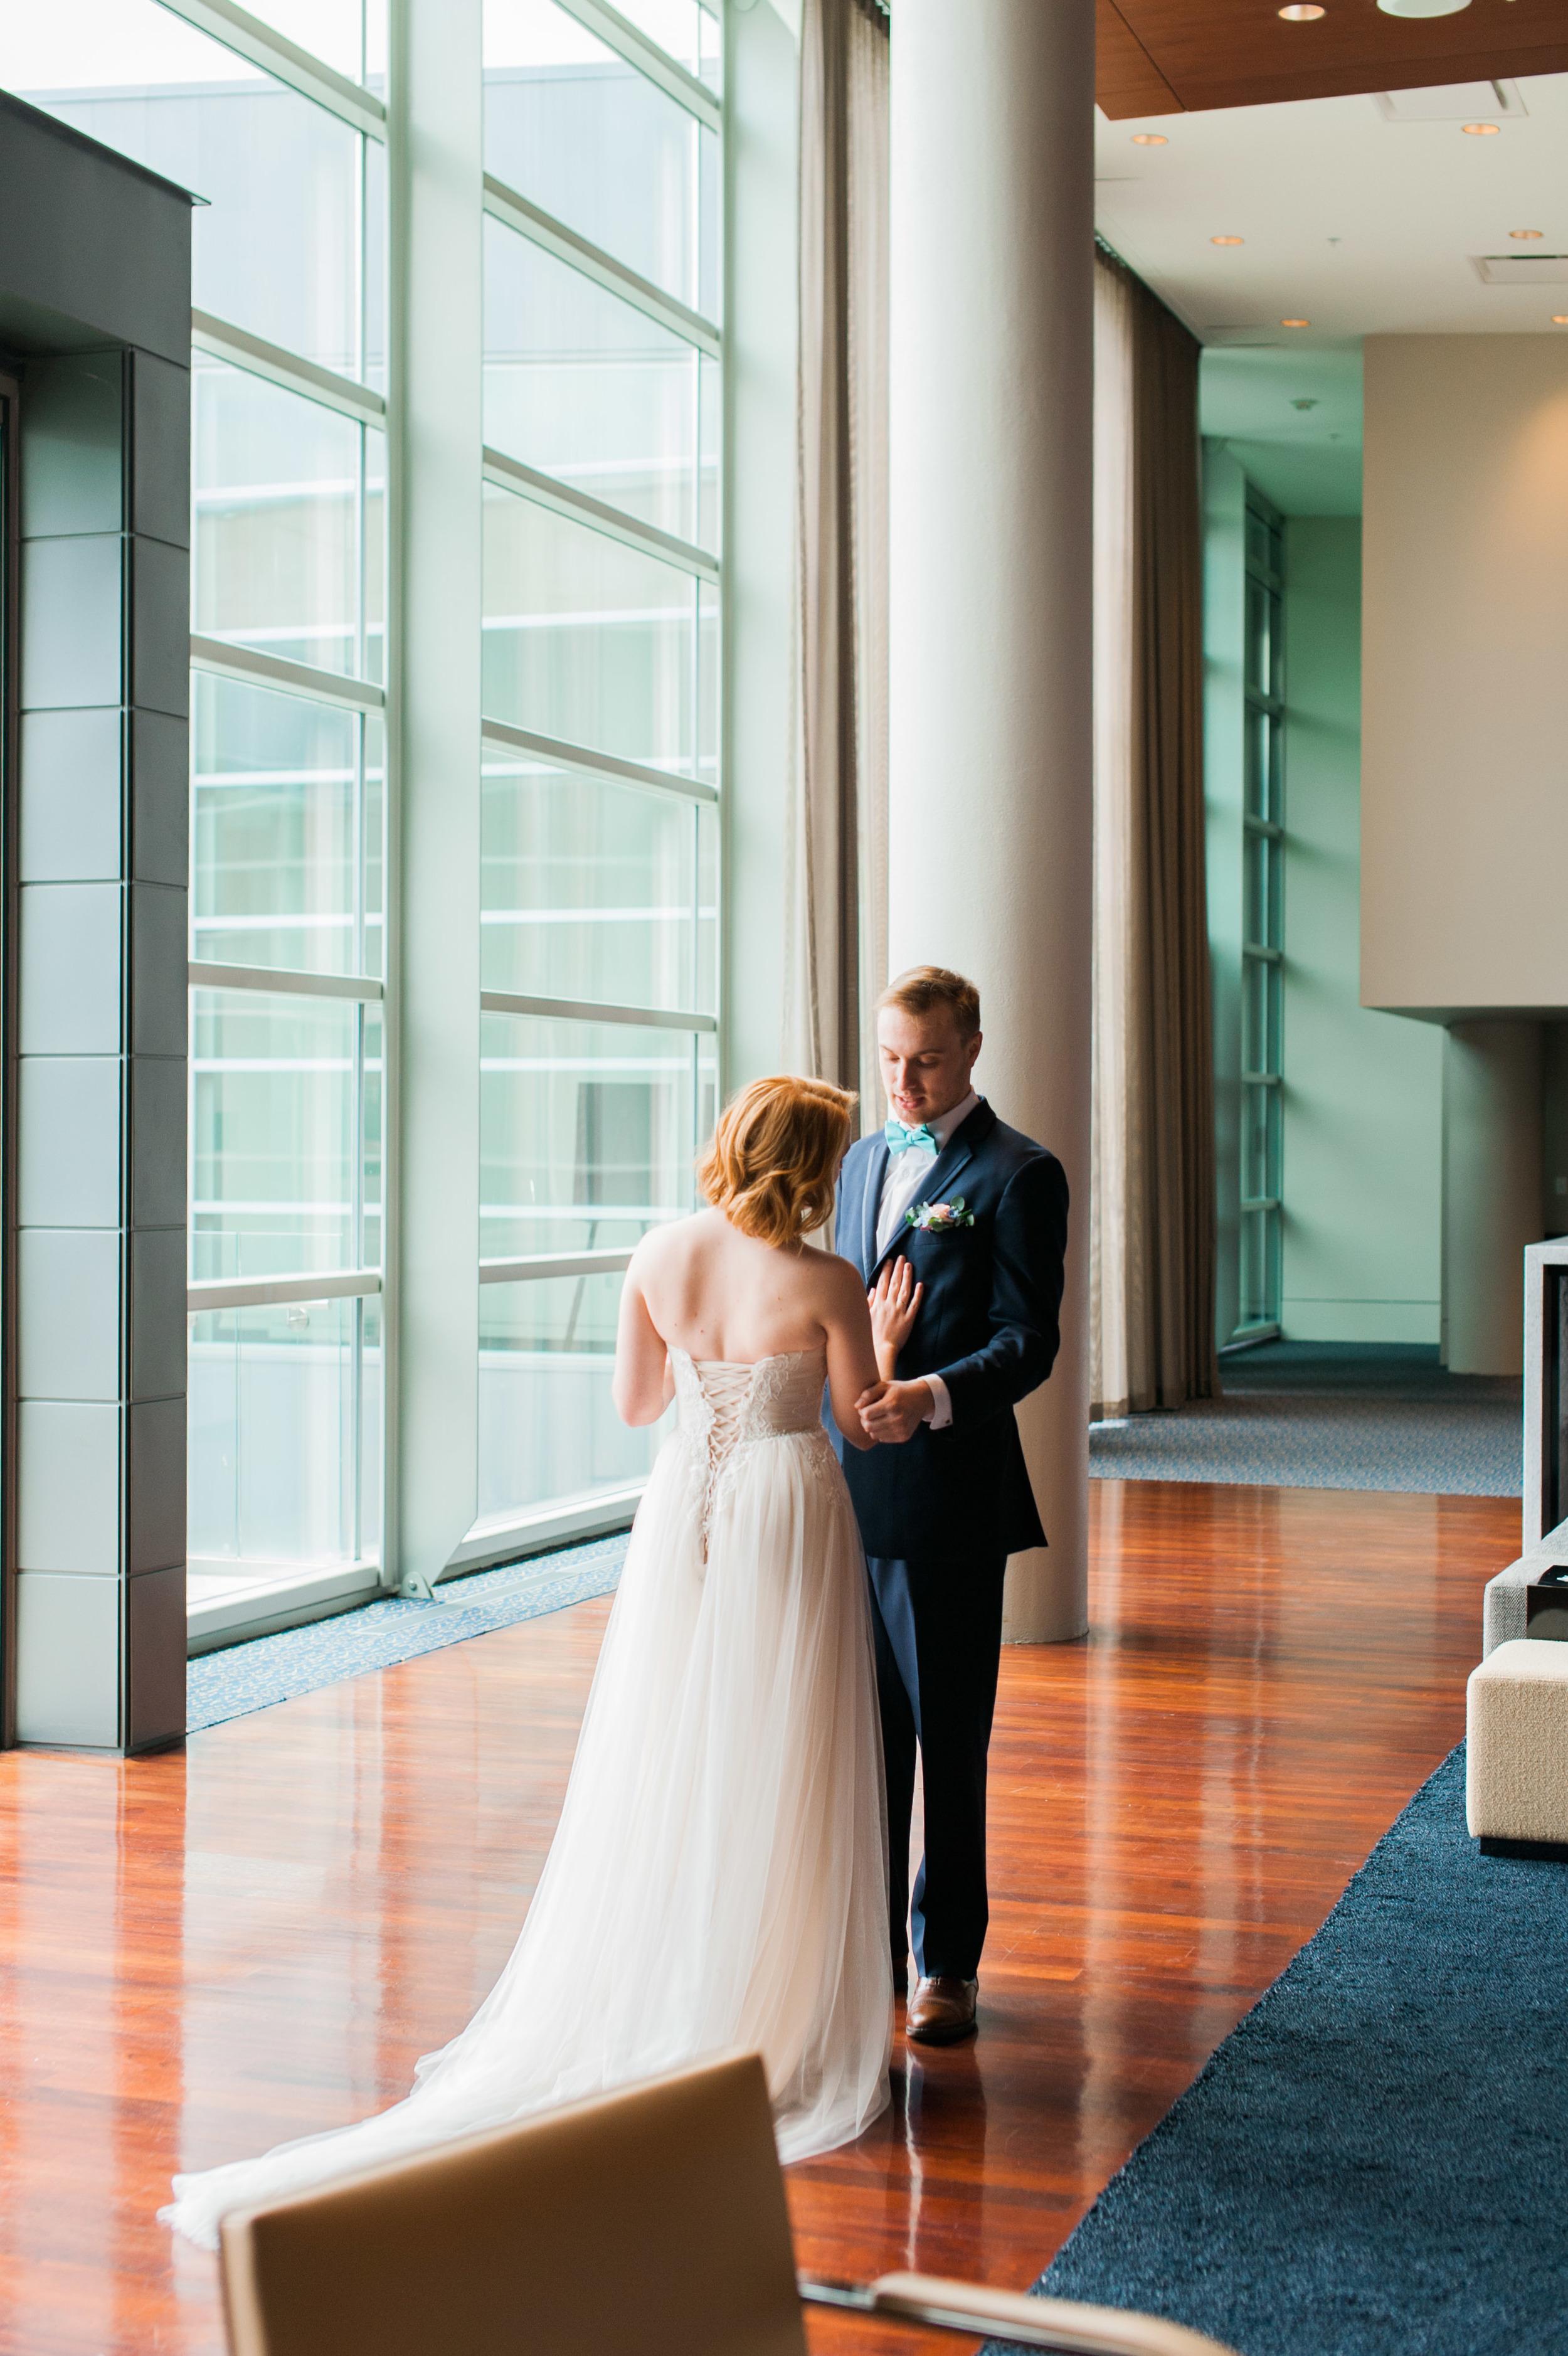 omaha-holland-arts-center-wedding-30.jpg